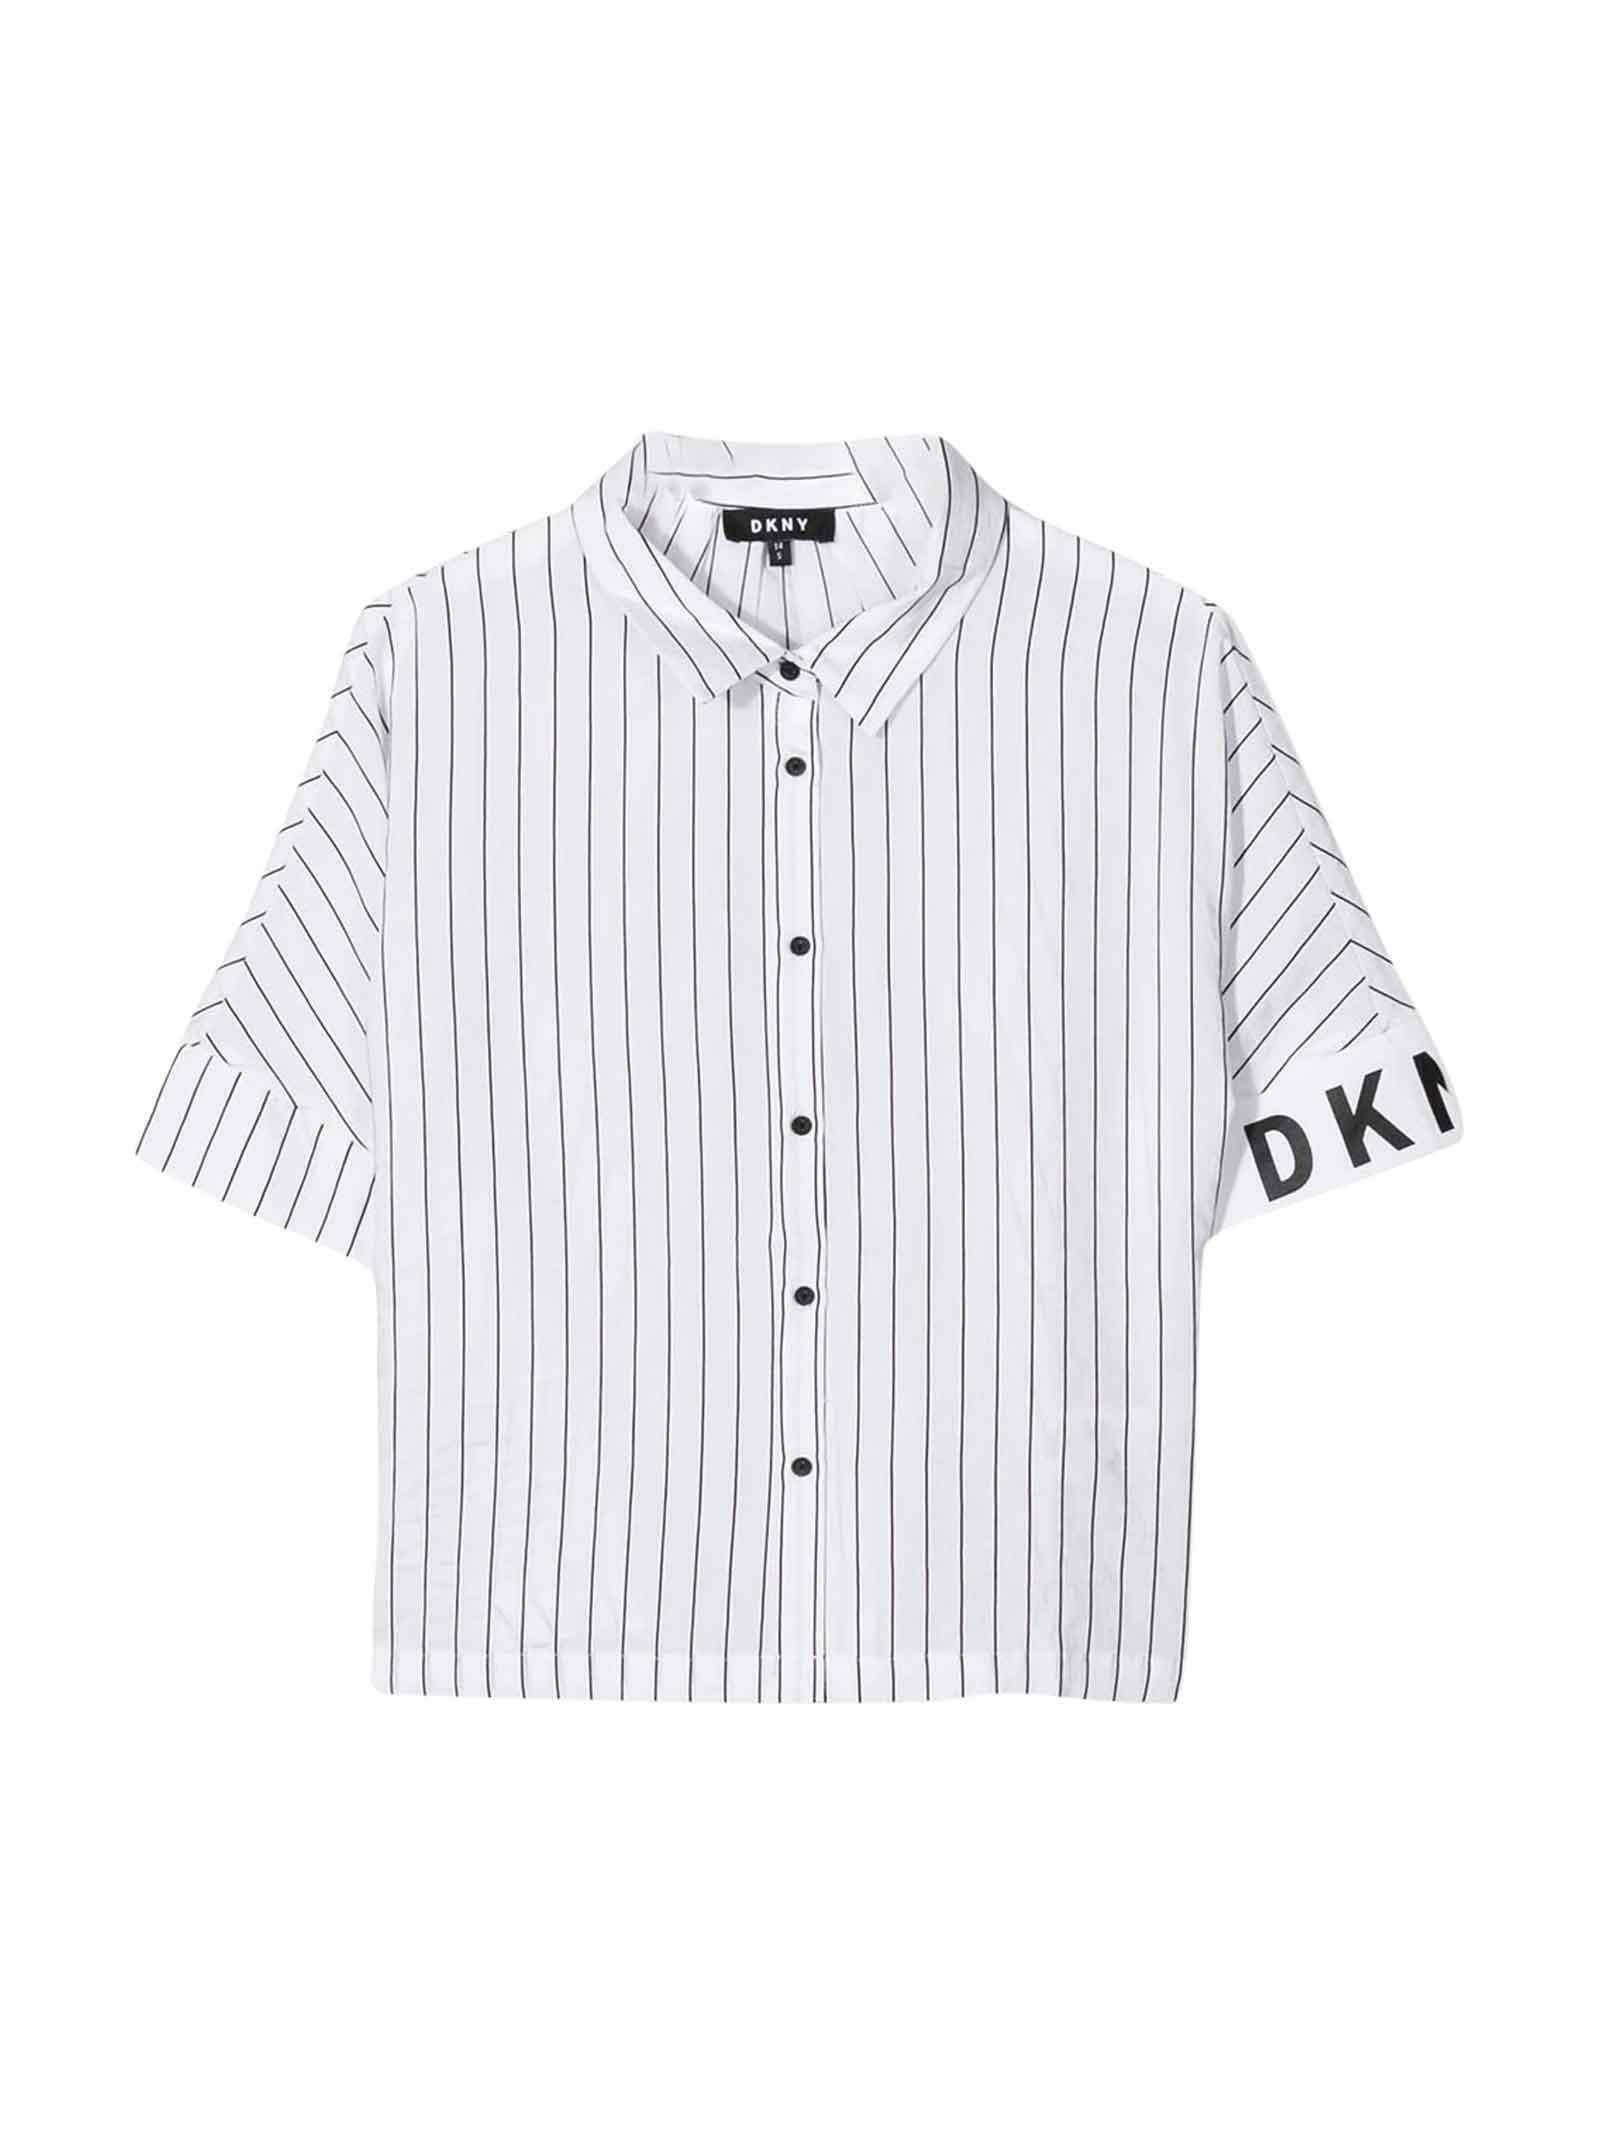 dkny dkny camicia ragazza bianco d35q631